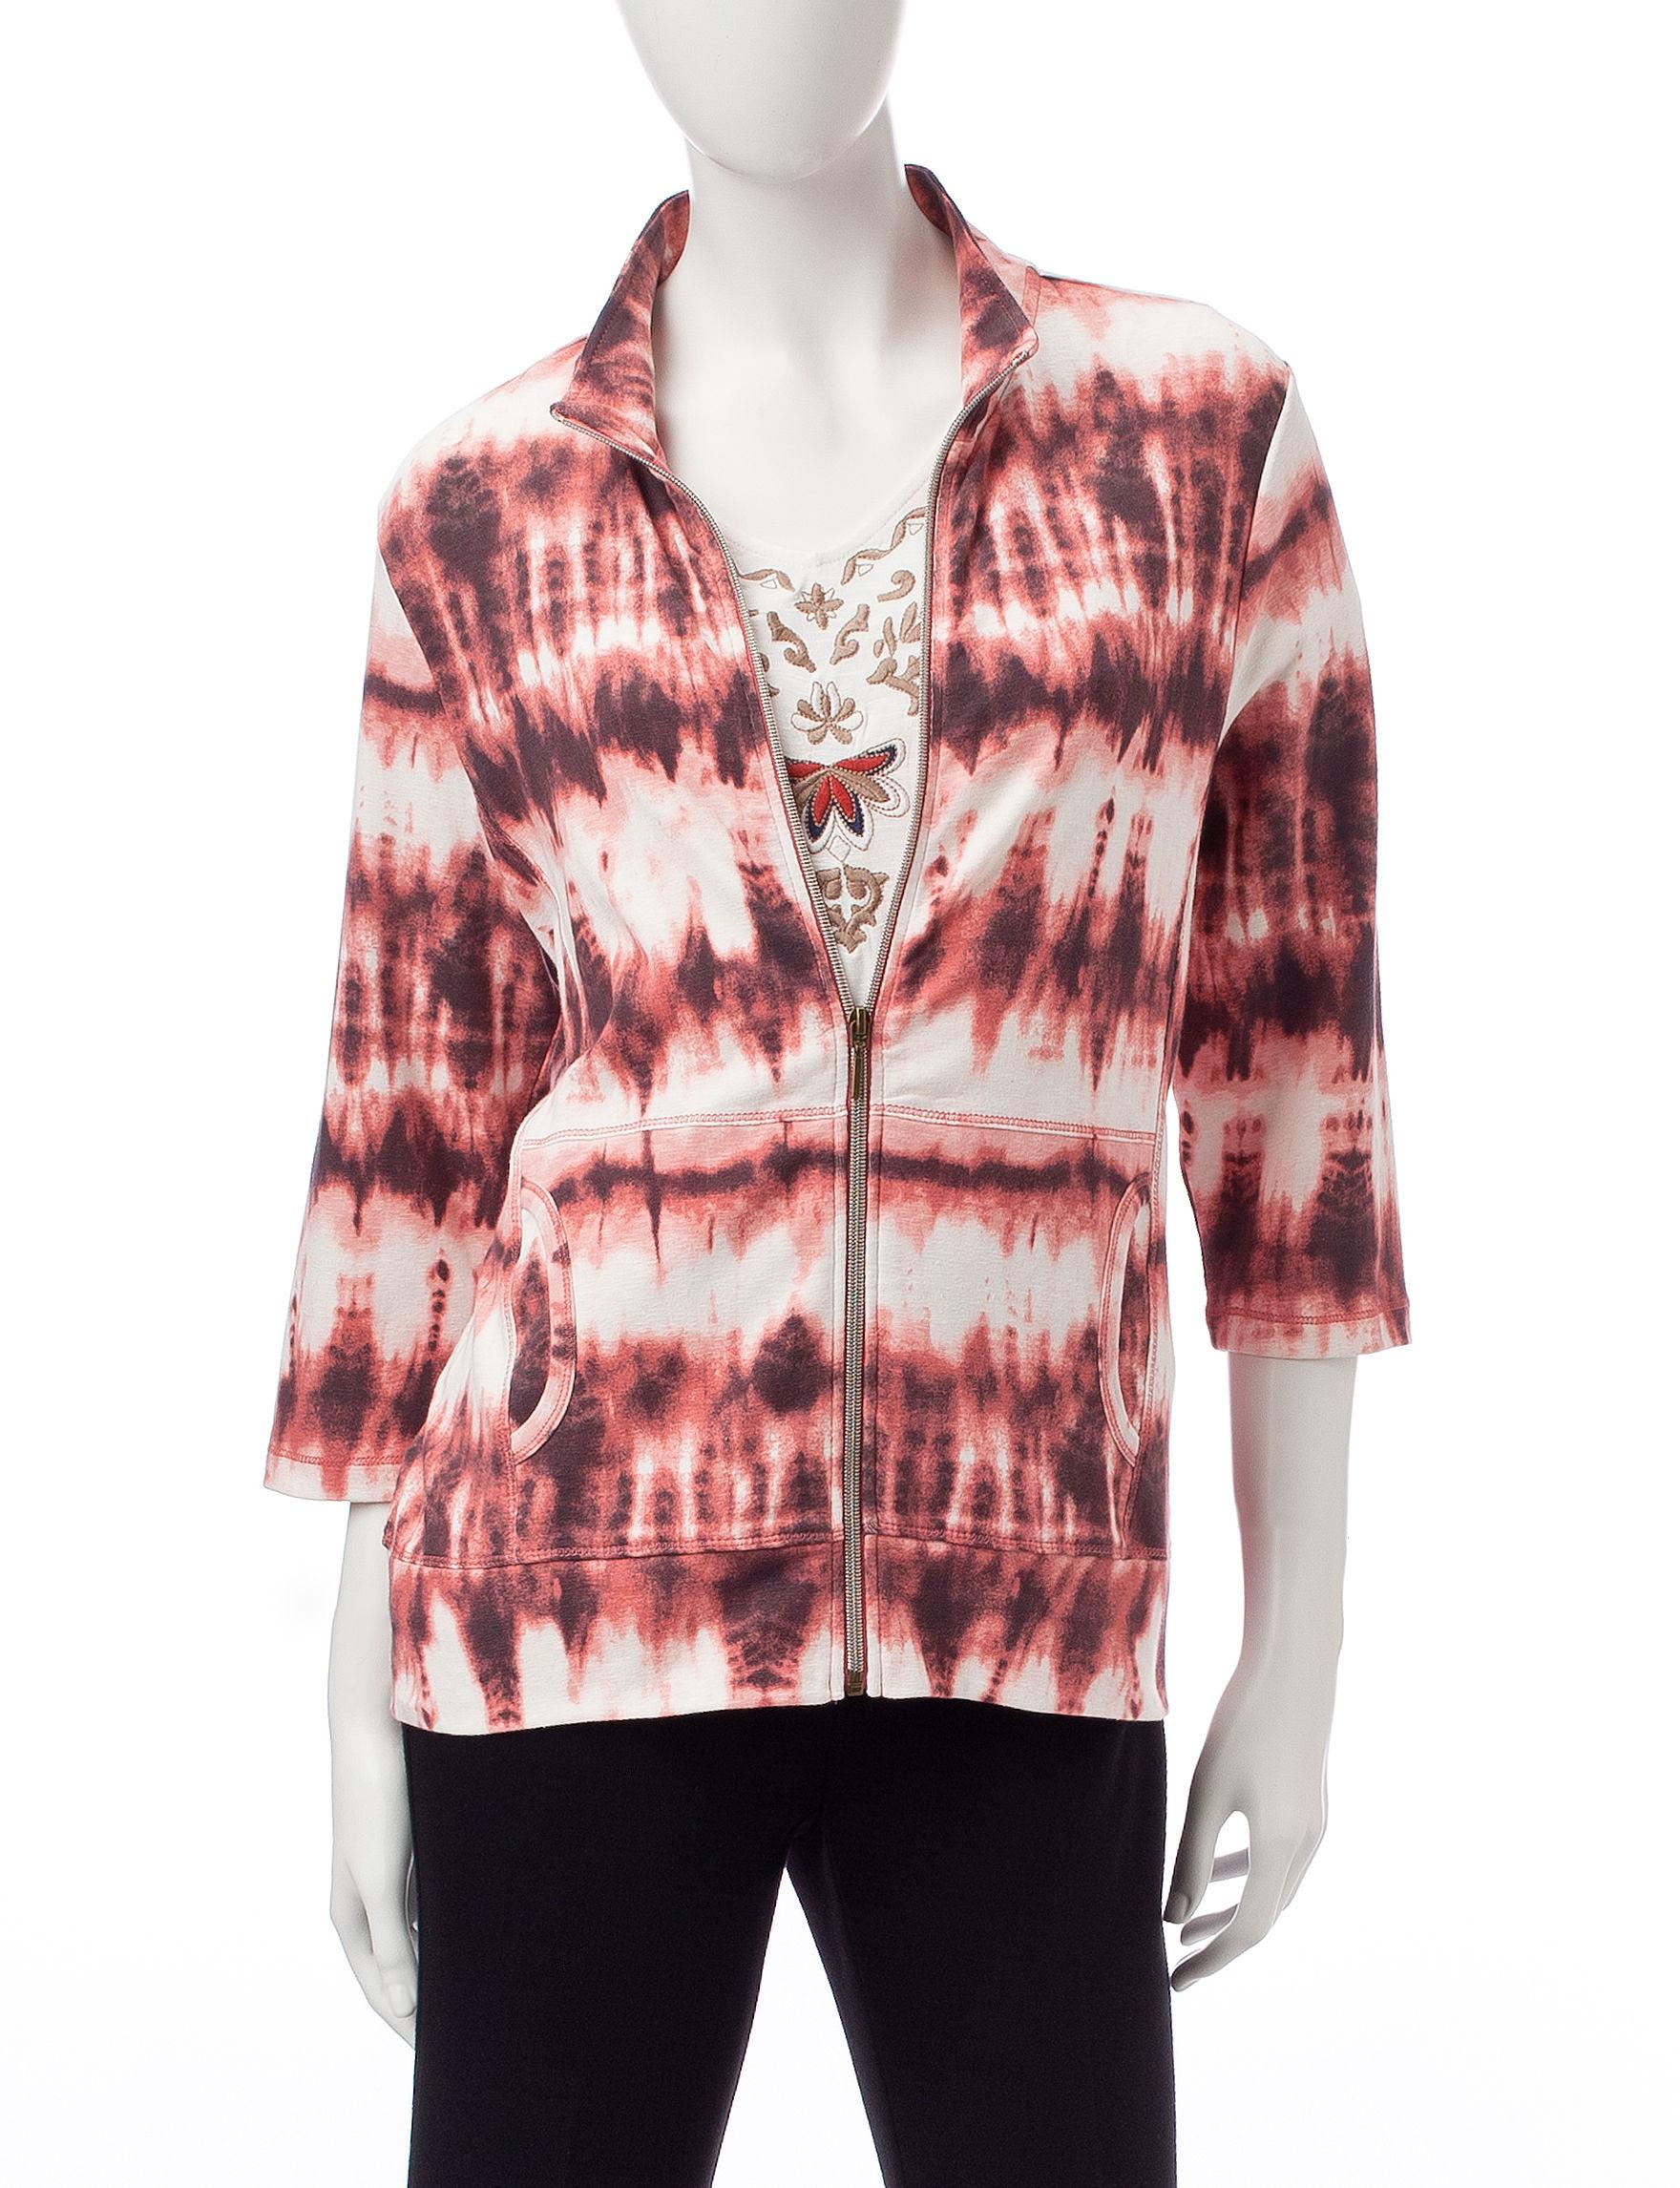 Onque Casuals Pink Lightweight Jackets & Blazers